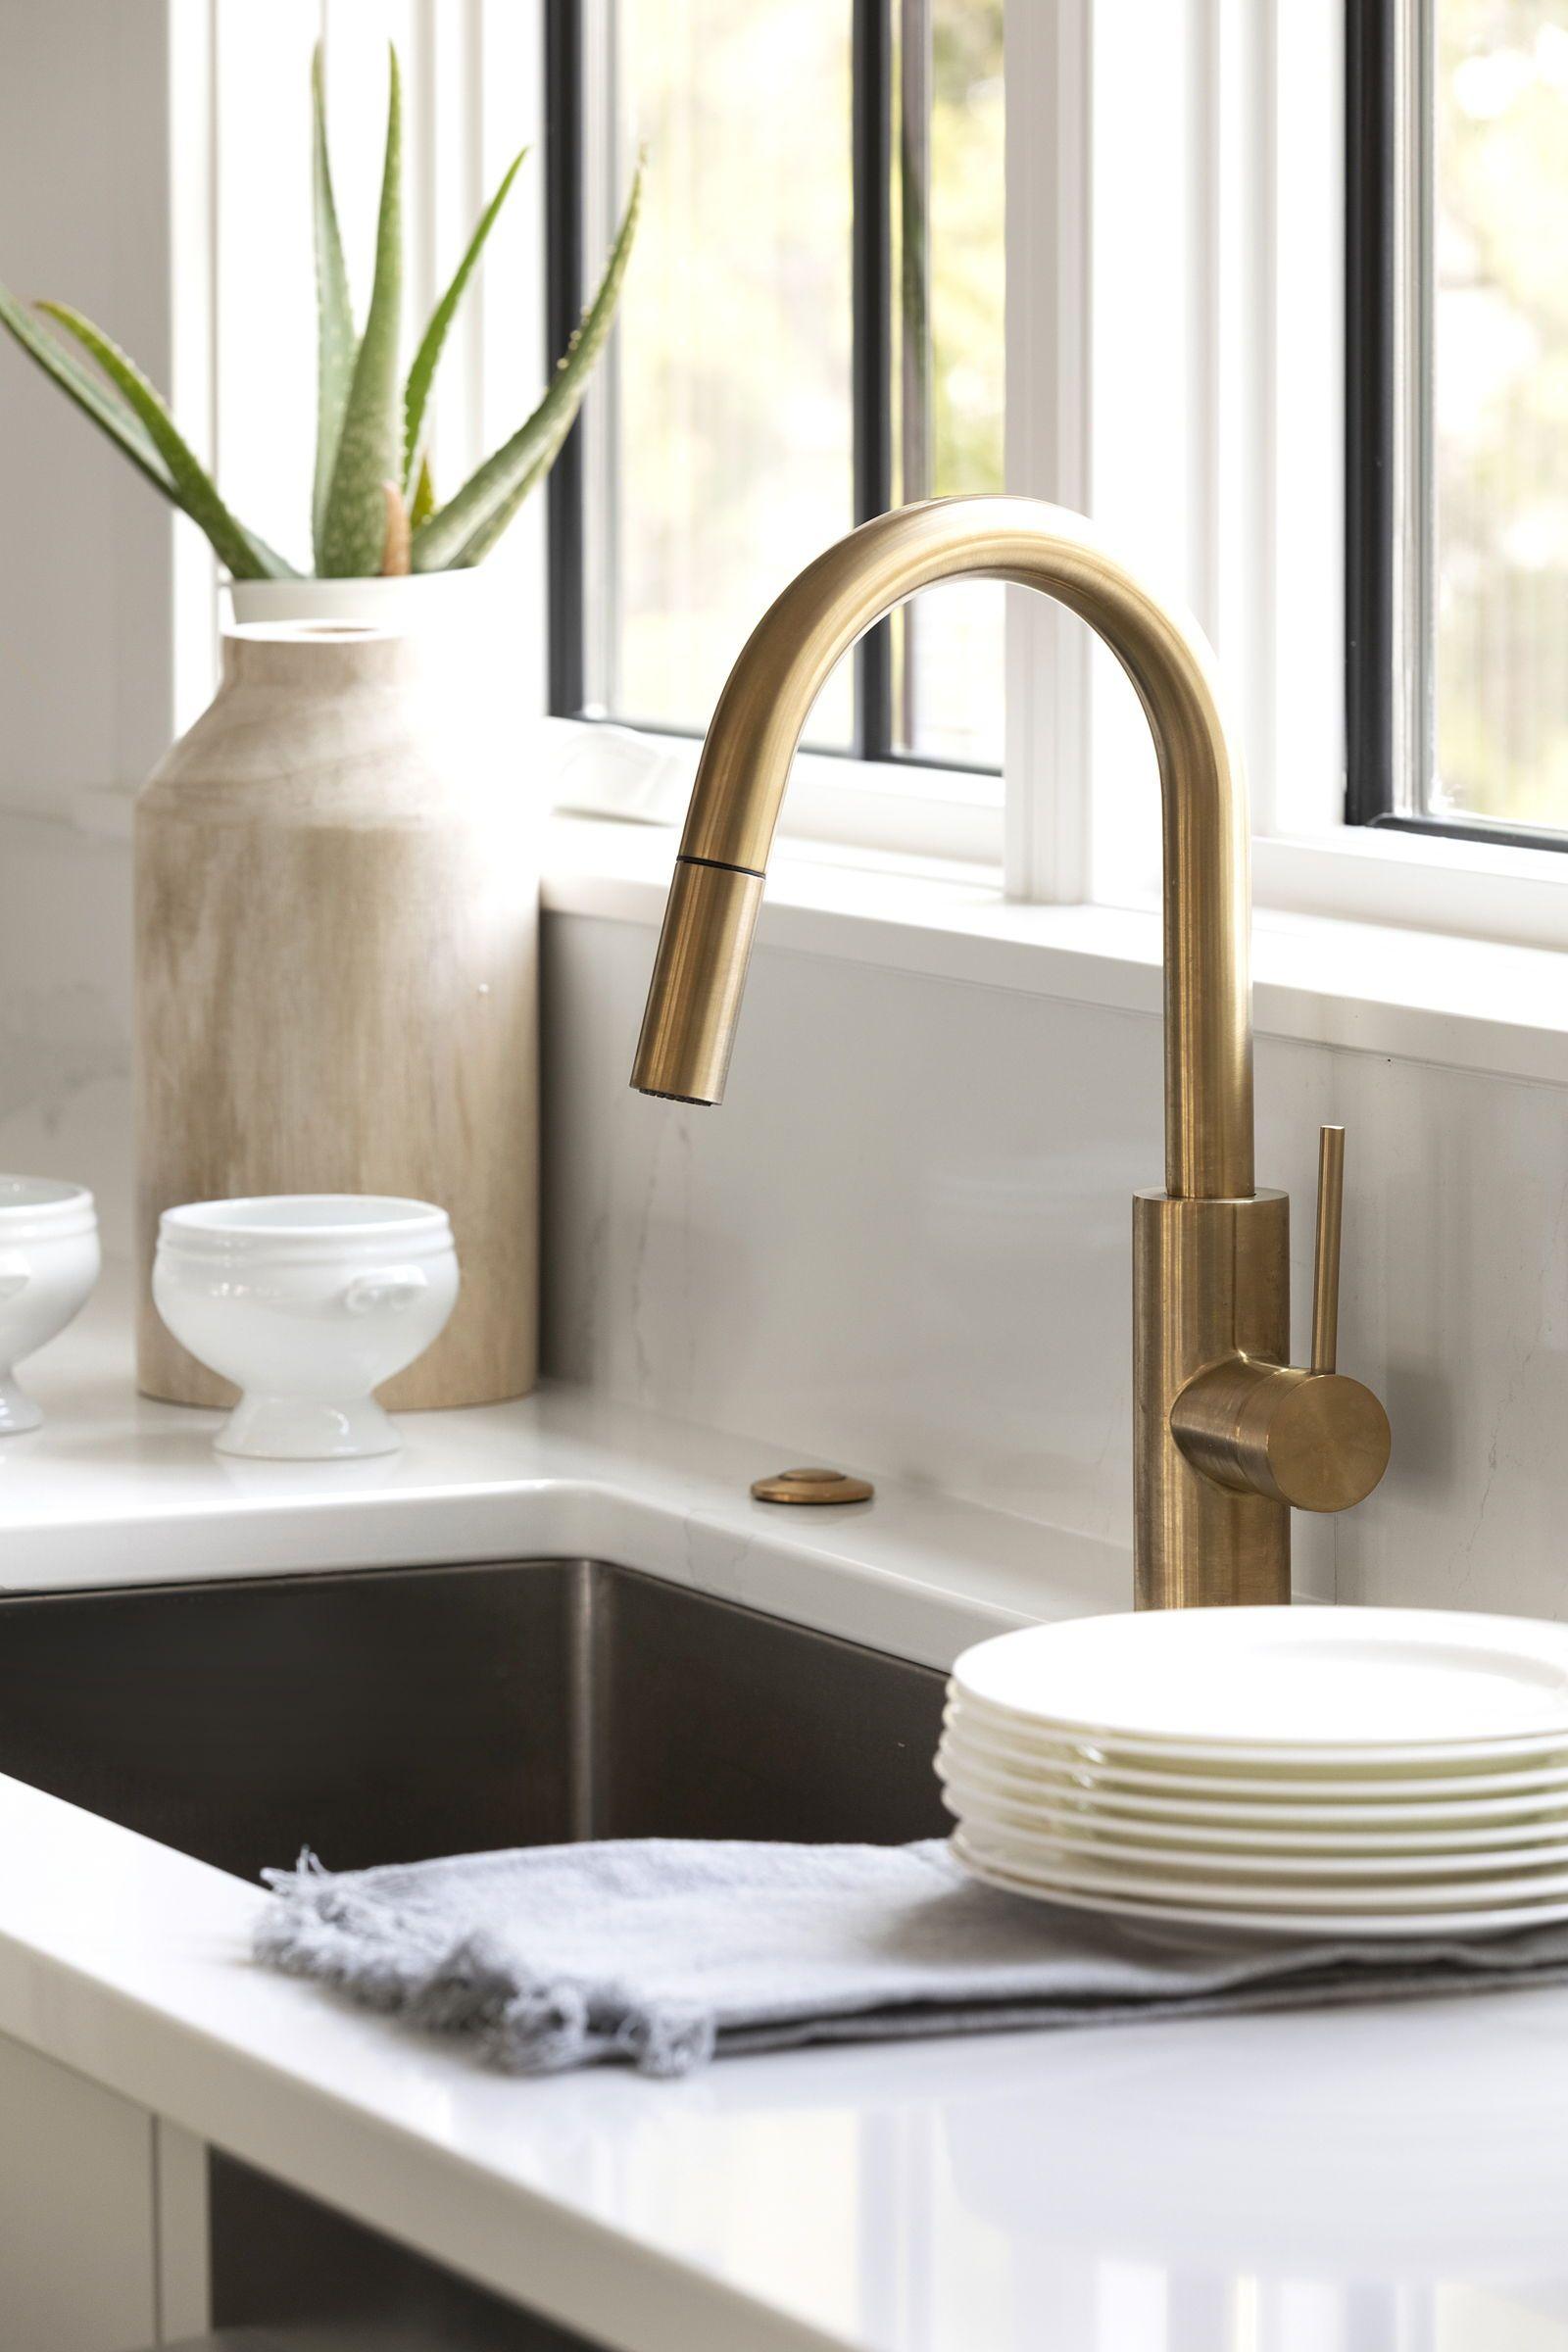 Brass Faucet House Plumbing Plumbing Fixtures Brass Kitchen Sink